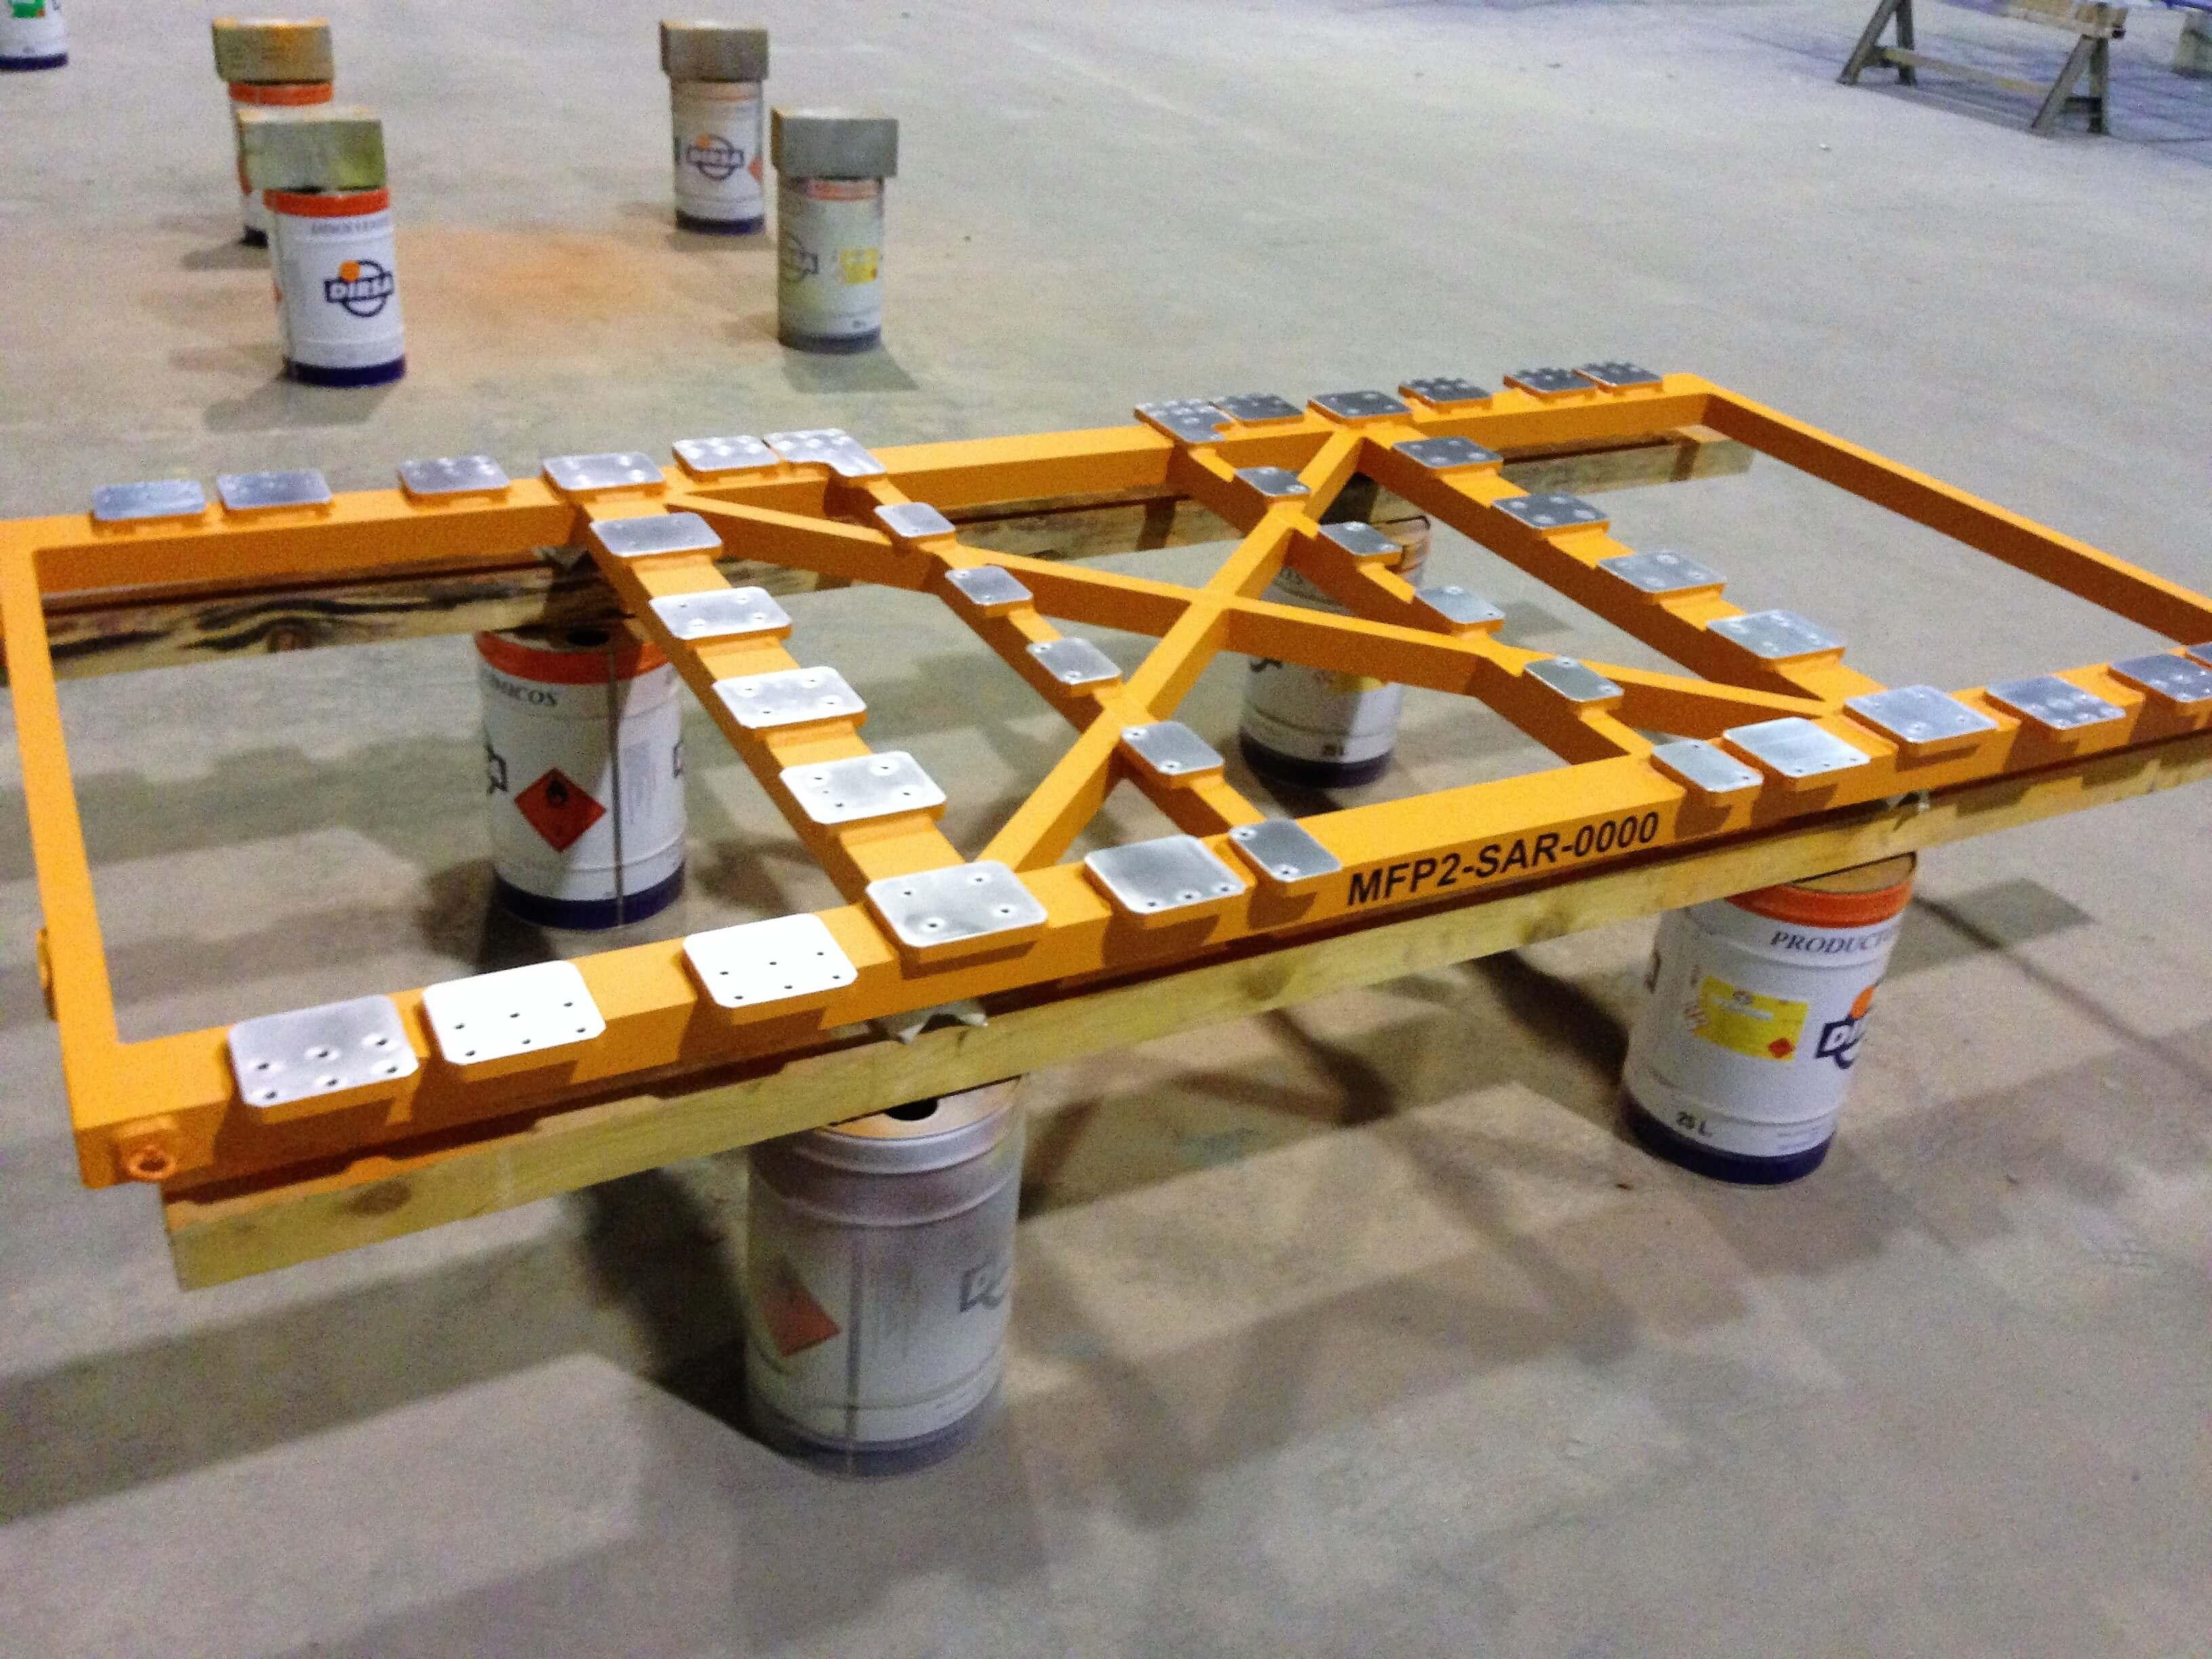 IMG 2577 - Lifting Tools